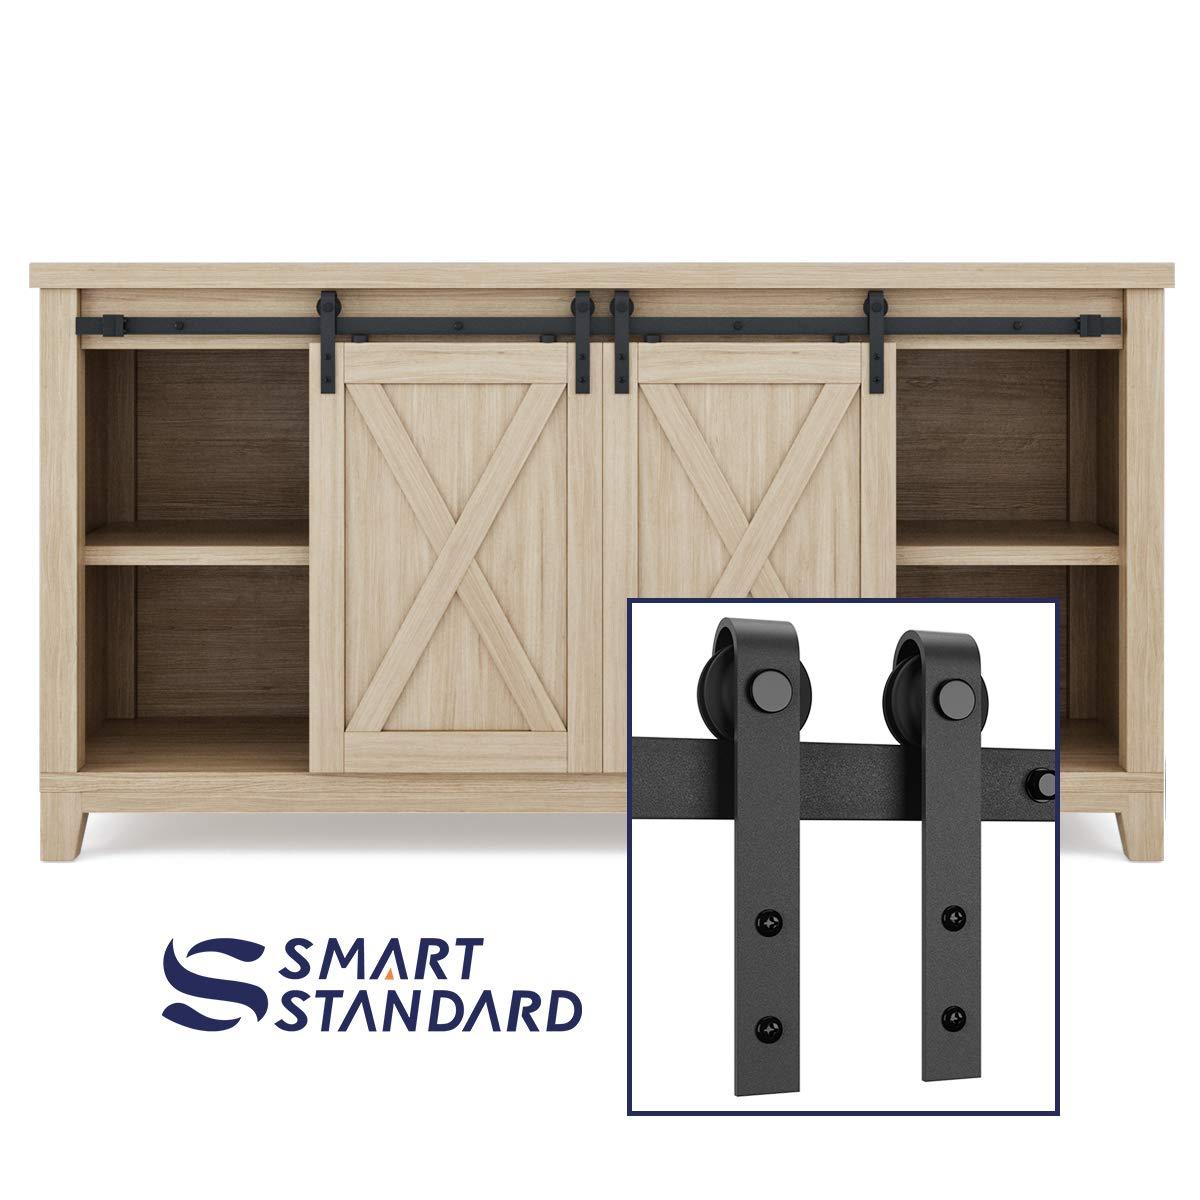 SMARTSTANDARD 5ft Double Cabinet Barn Door Hardware Kit - Super Mini Sliding Door Hardware - for Cabinet TV Stand Console - Simple and Easy to Install - Fit 20'' Wide Door Panel (NO Cabinet) (J Shape)